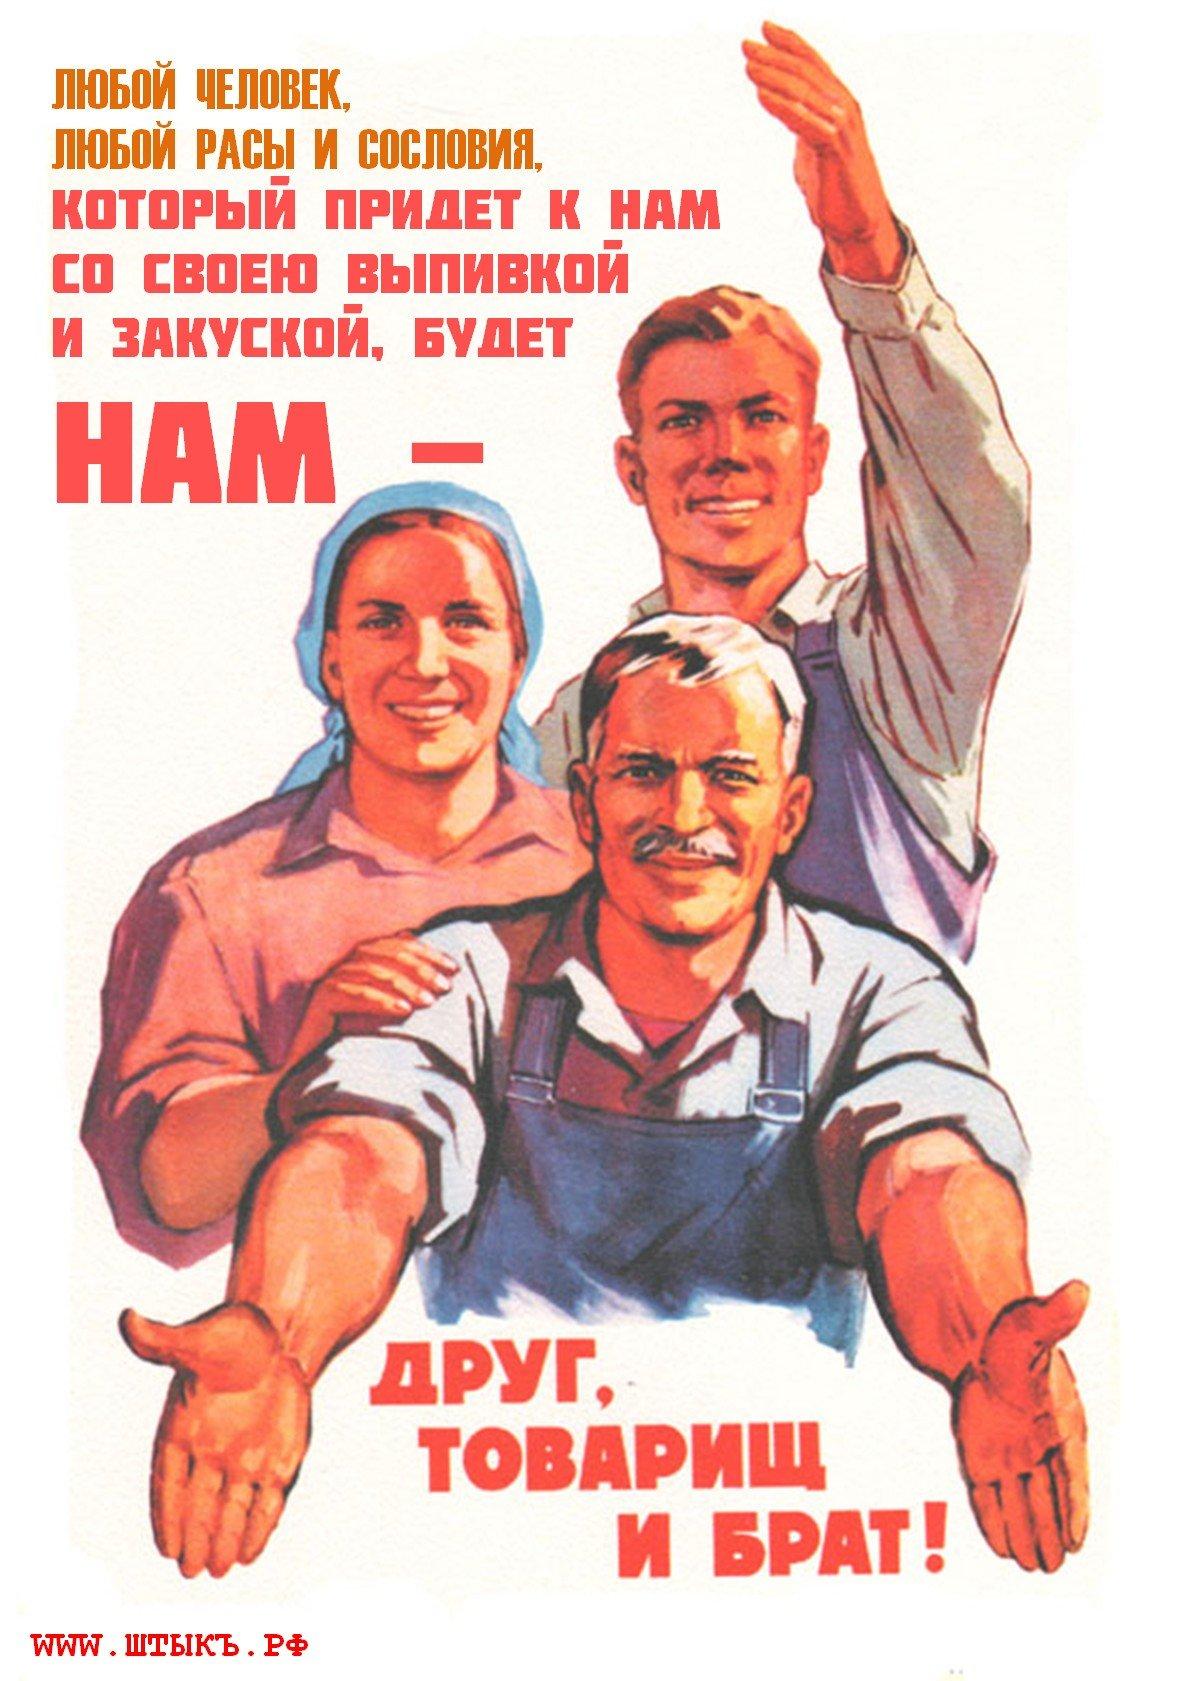 один плакаты советских времен фото именно